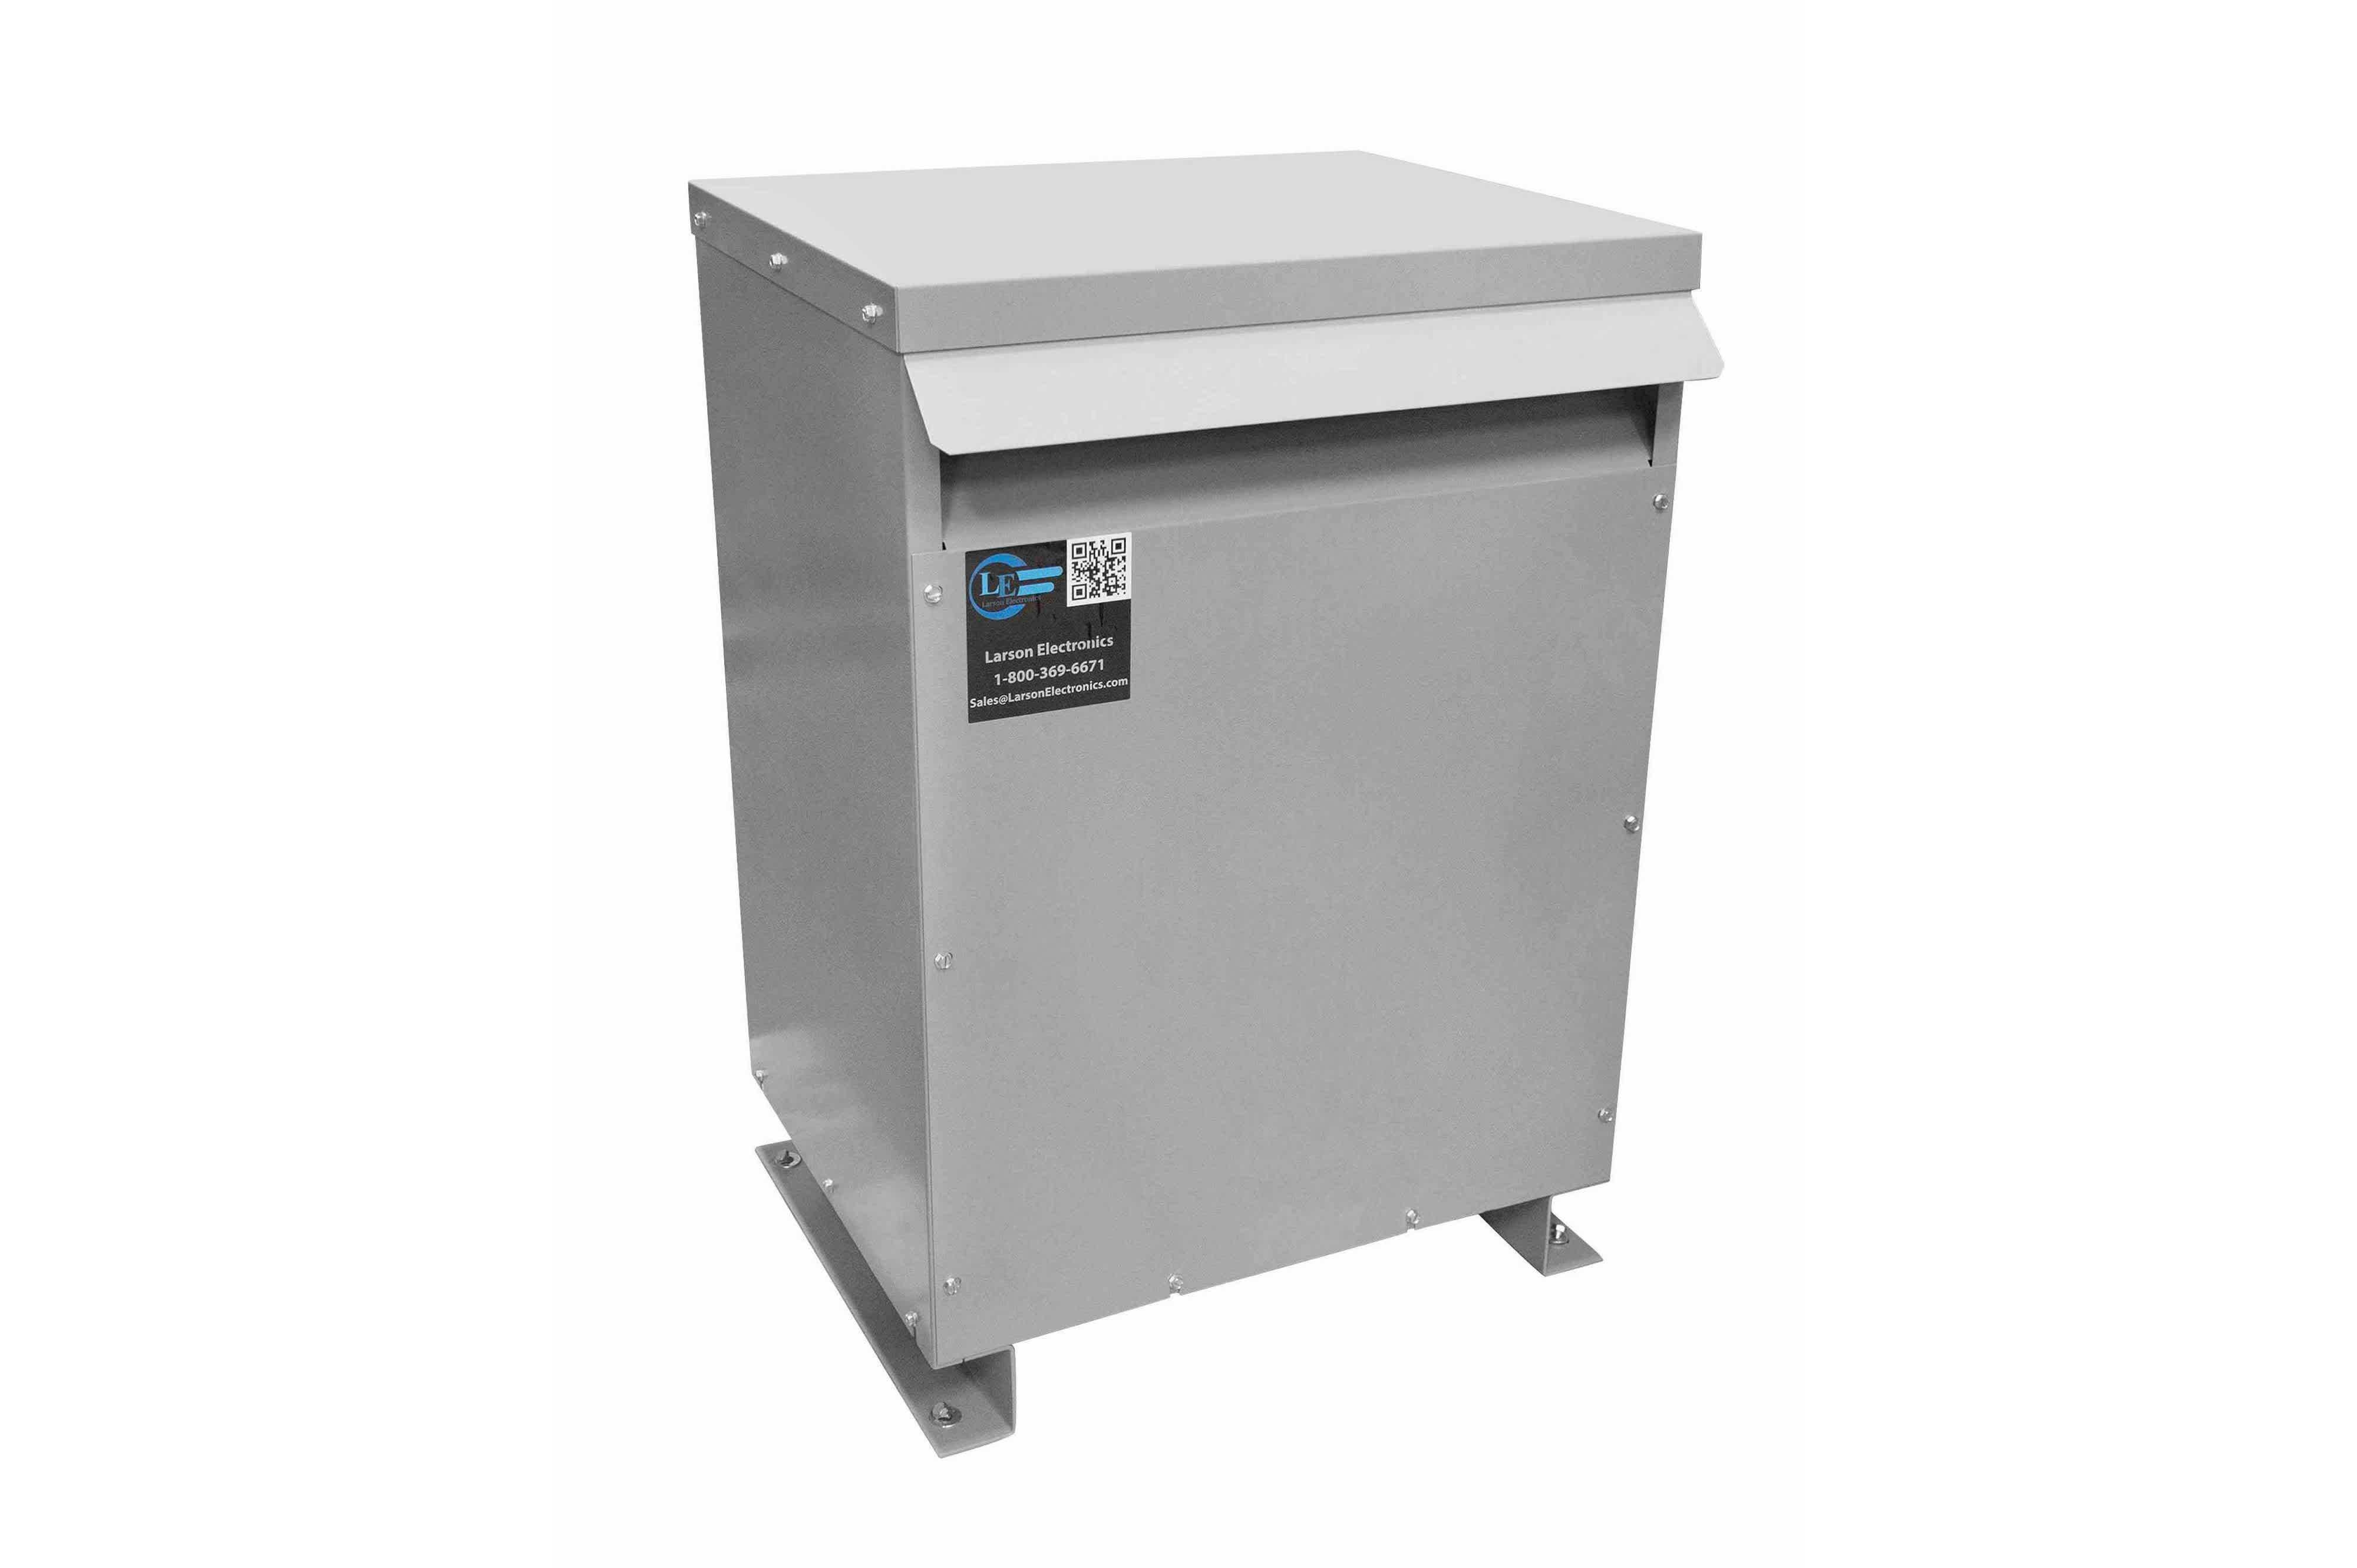 80 kVA 3PH DOE Transformer, 575V Delta Primary, 415Y/240 Wye-N Secondary, N3R, Ventilated, 60 Hz